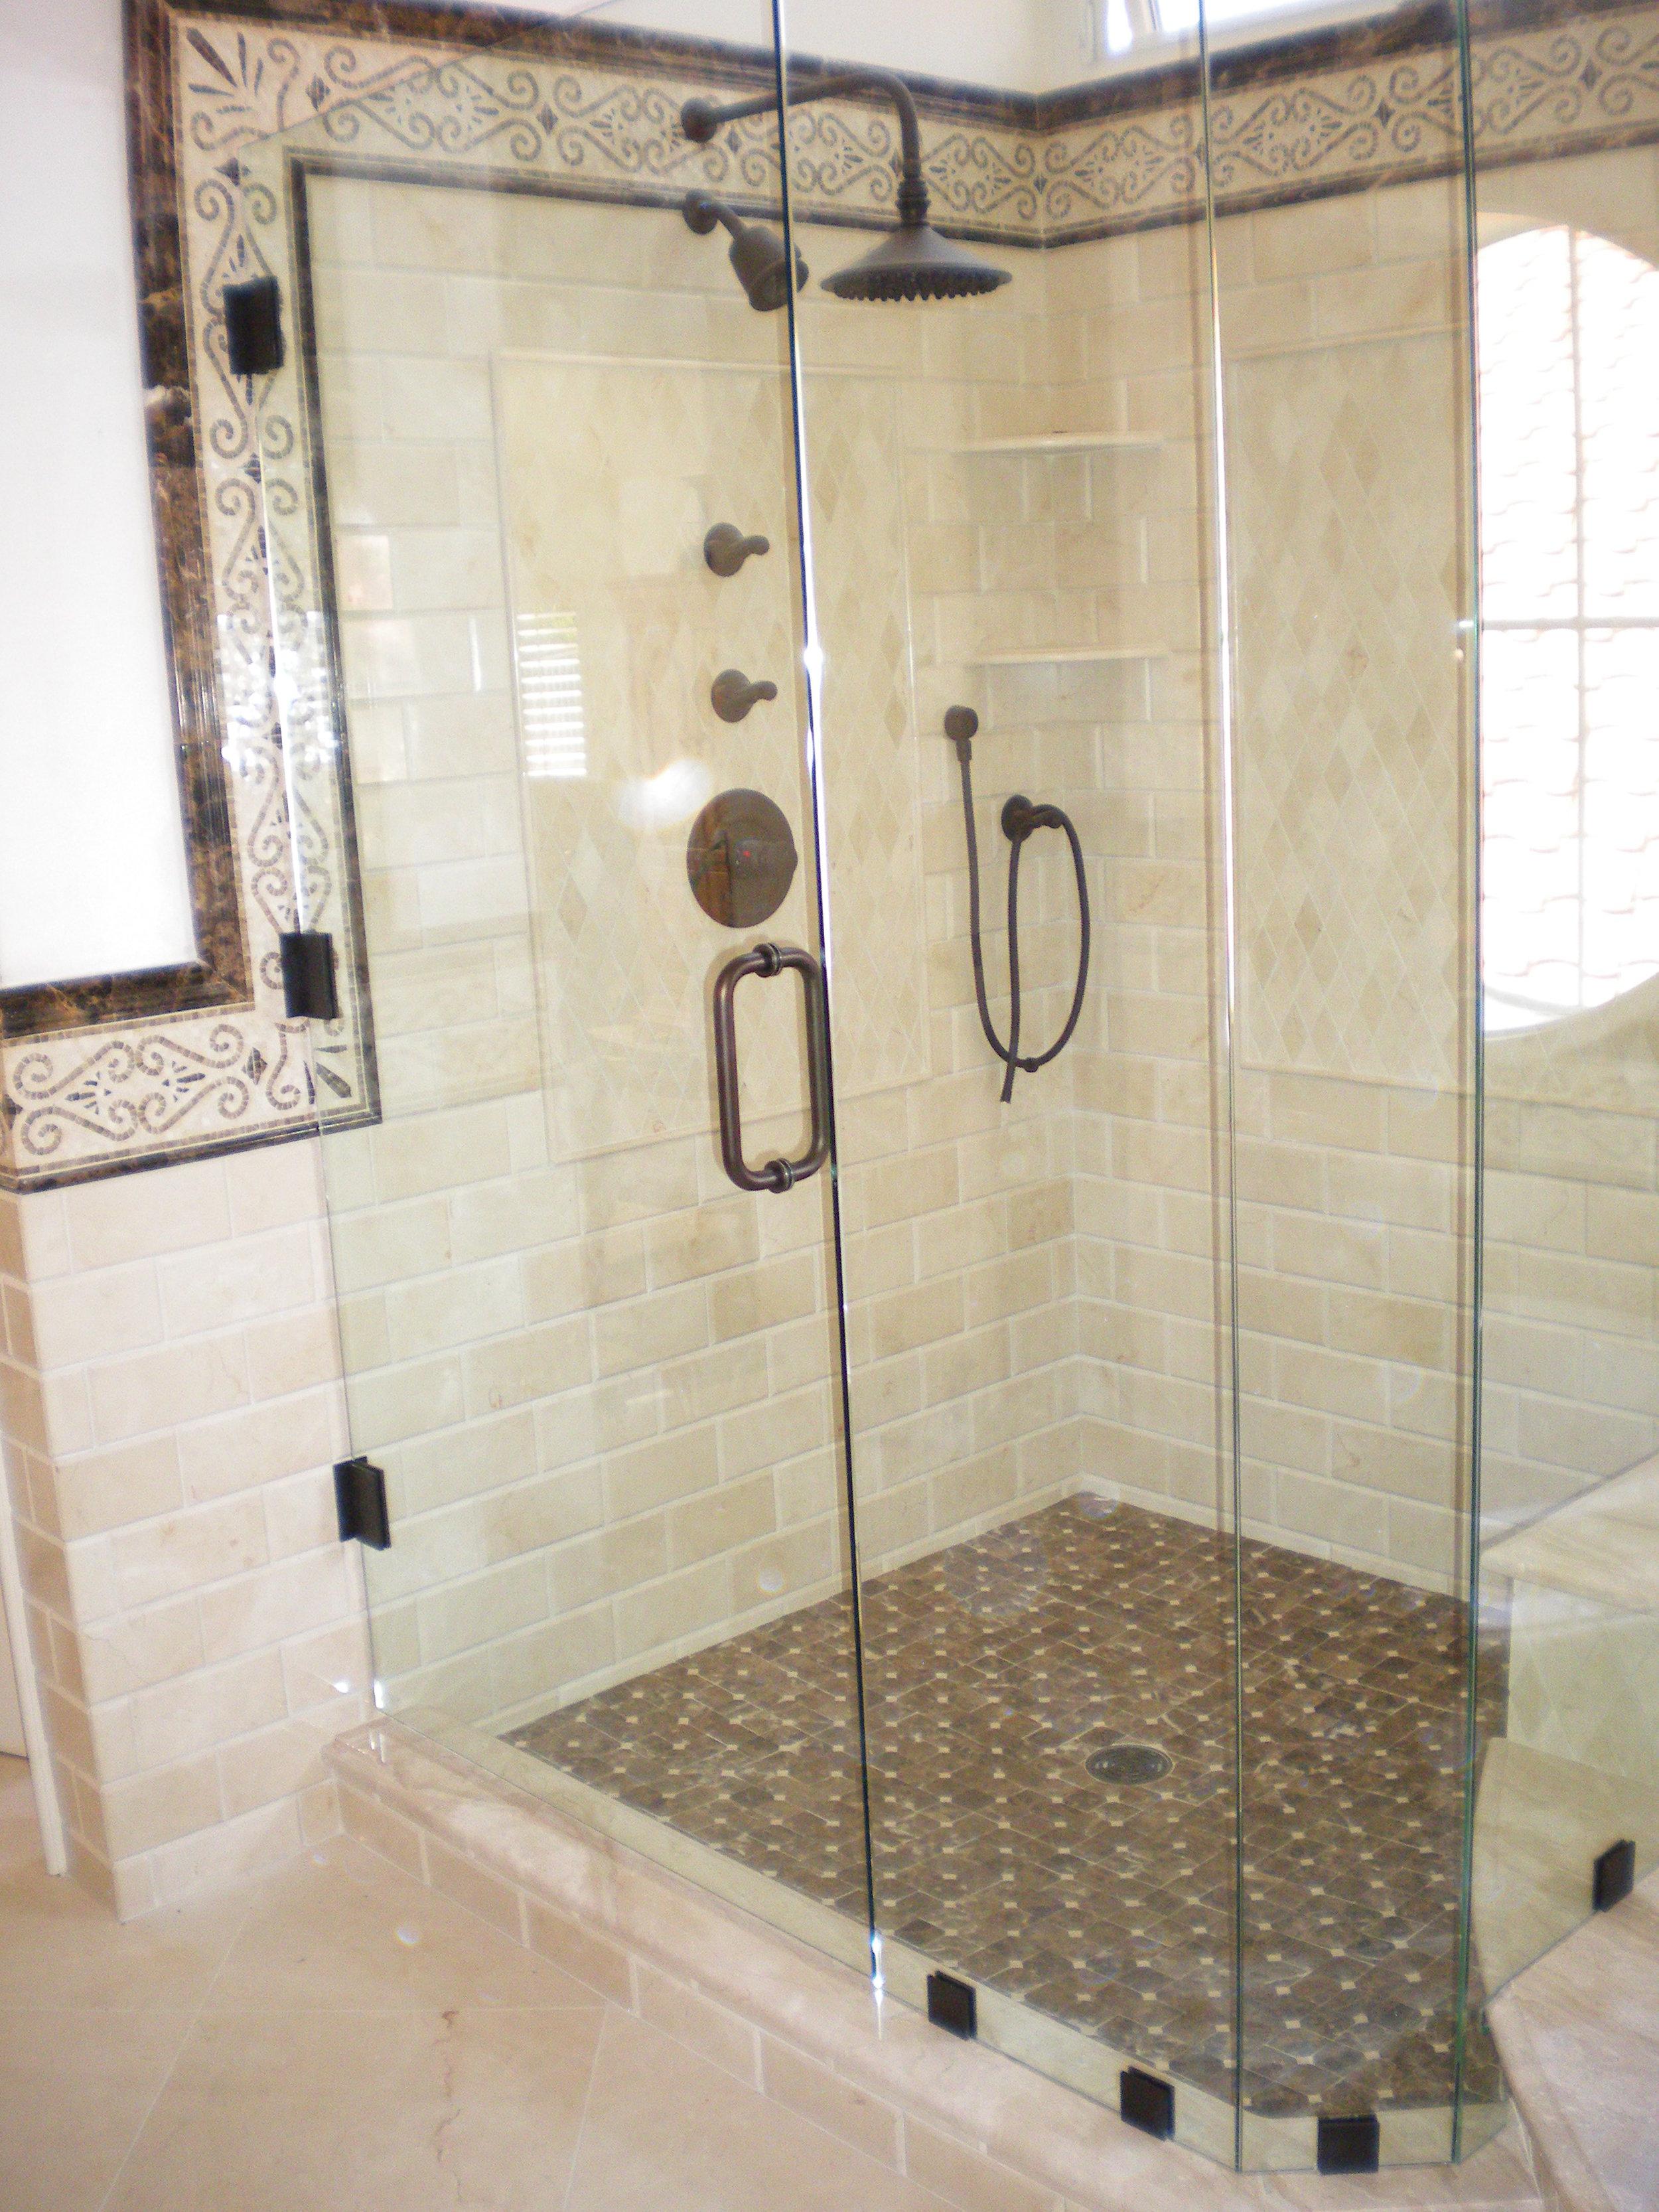 Shower-Doors-Residential-Photos-31.jpg